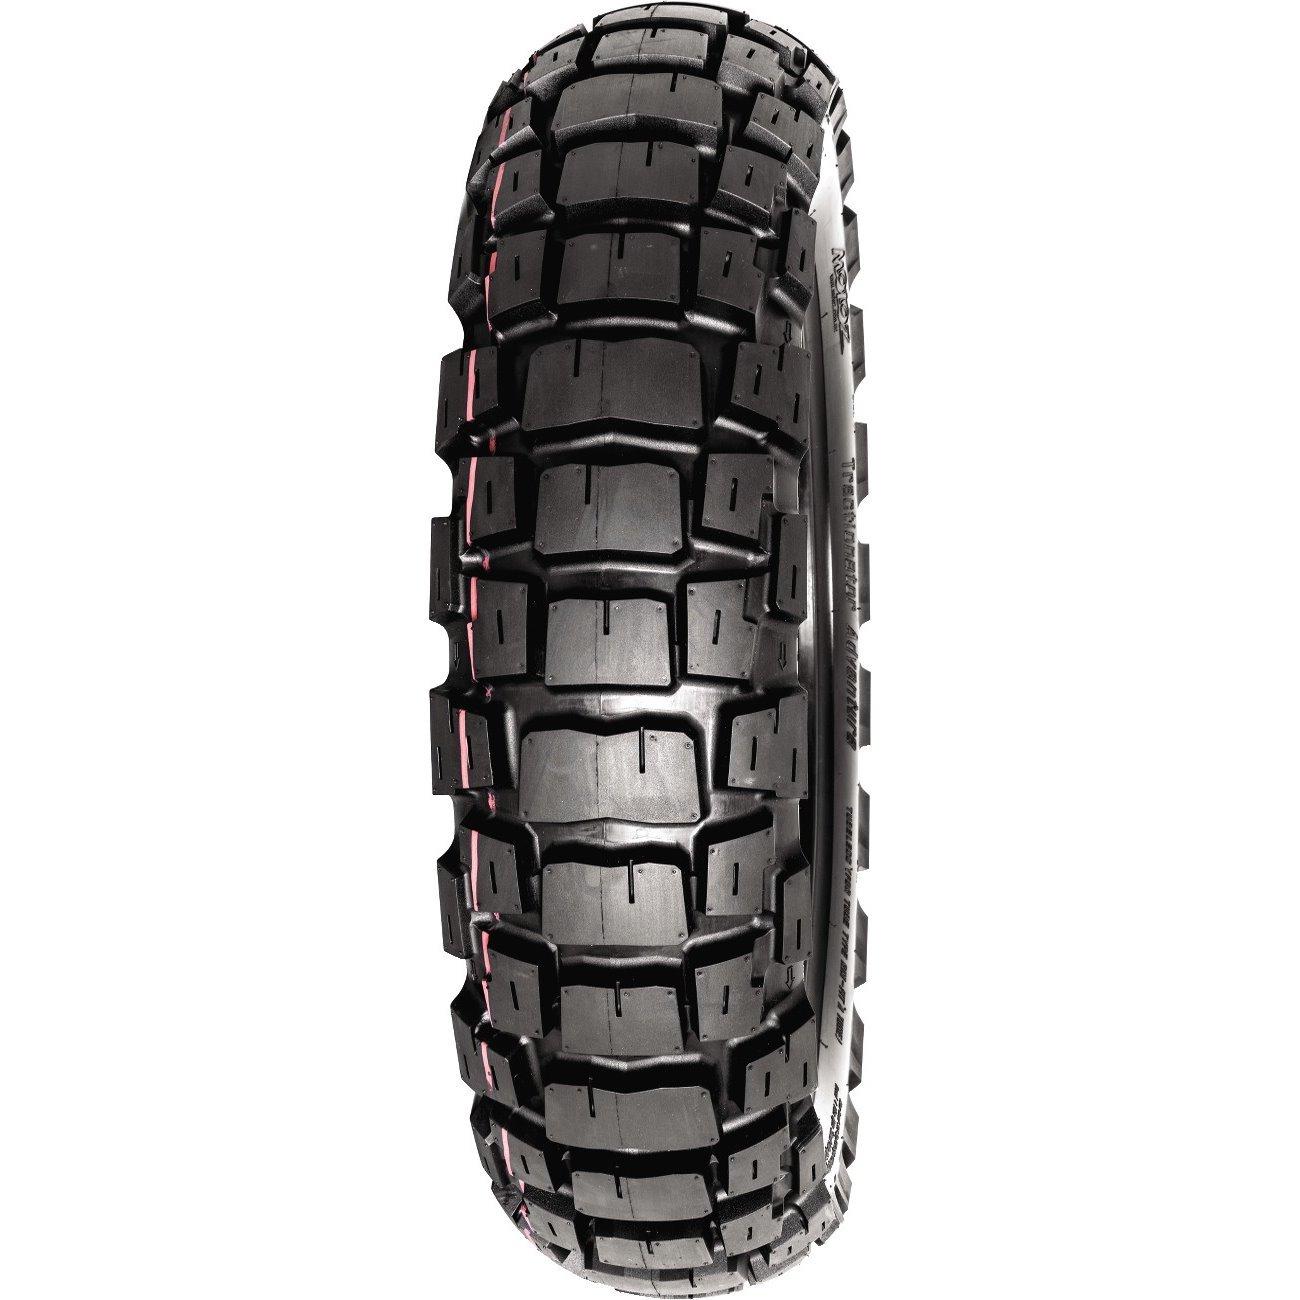 MOTOZ Tractionator Adventure 150/70-18 Dual Sport Motorcycle Tire, DOT